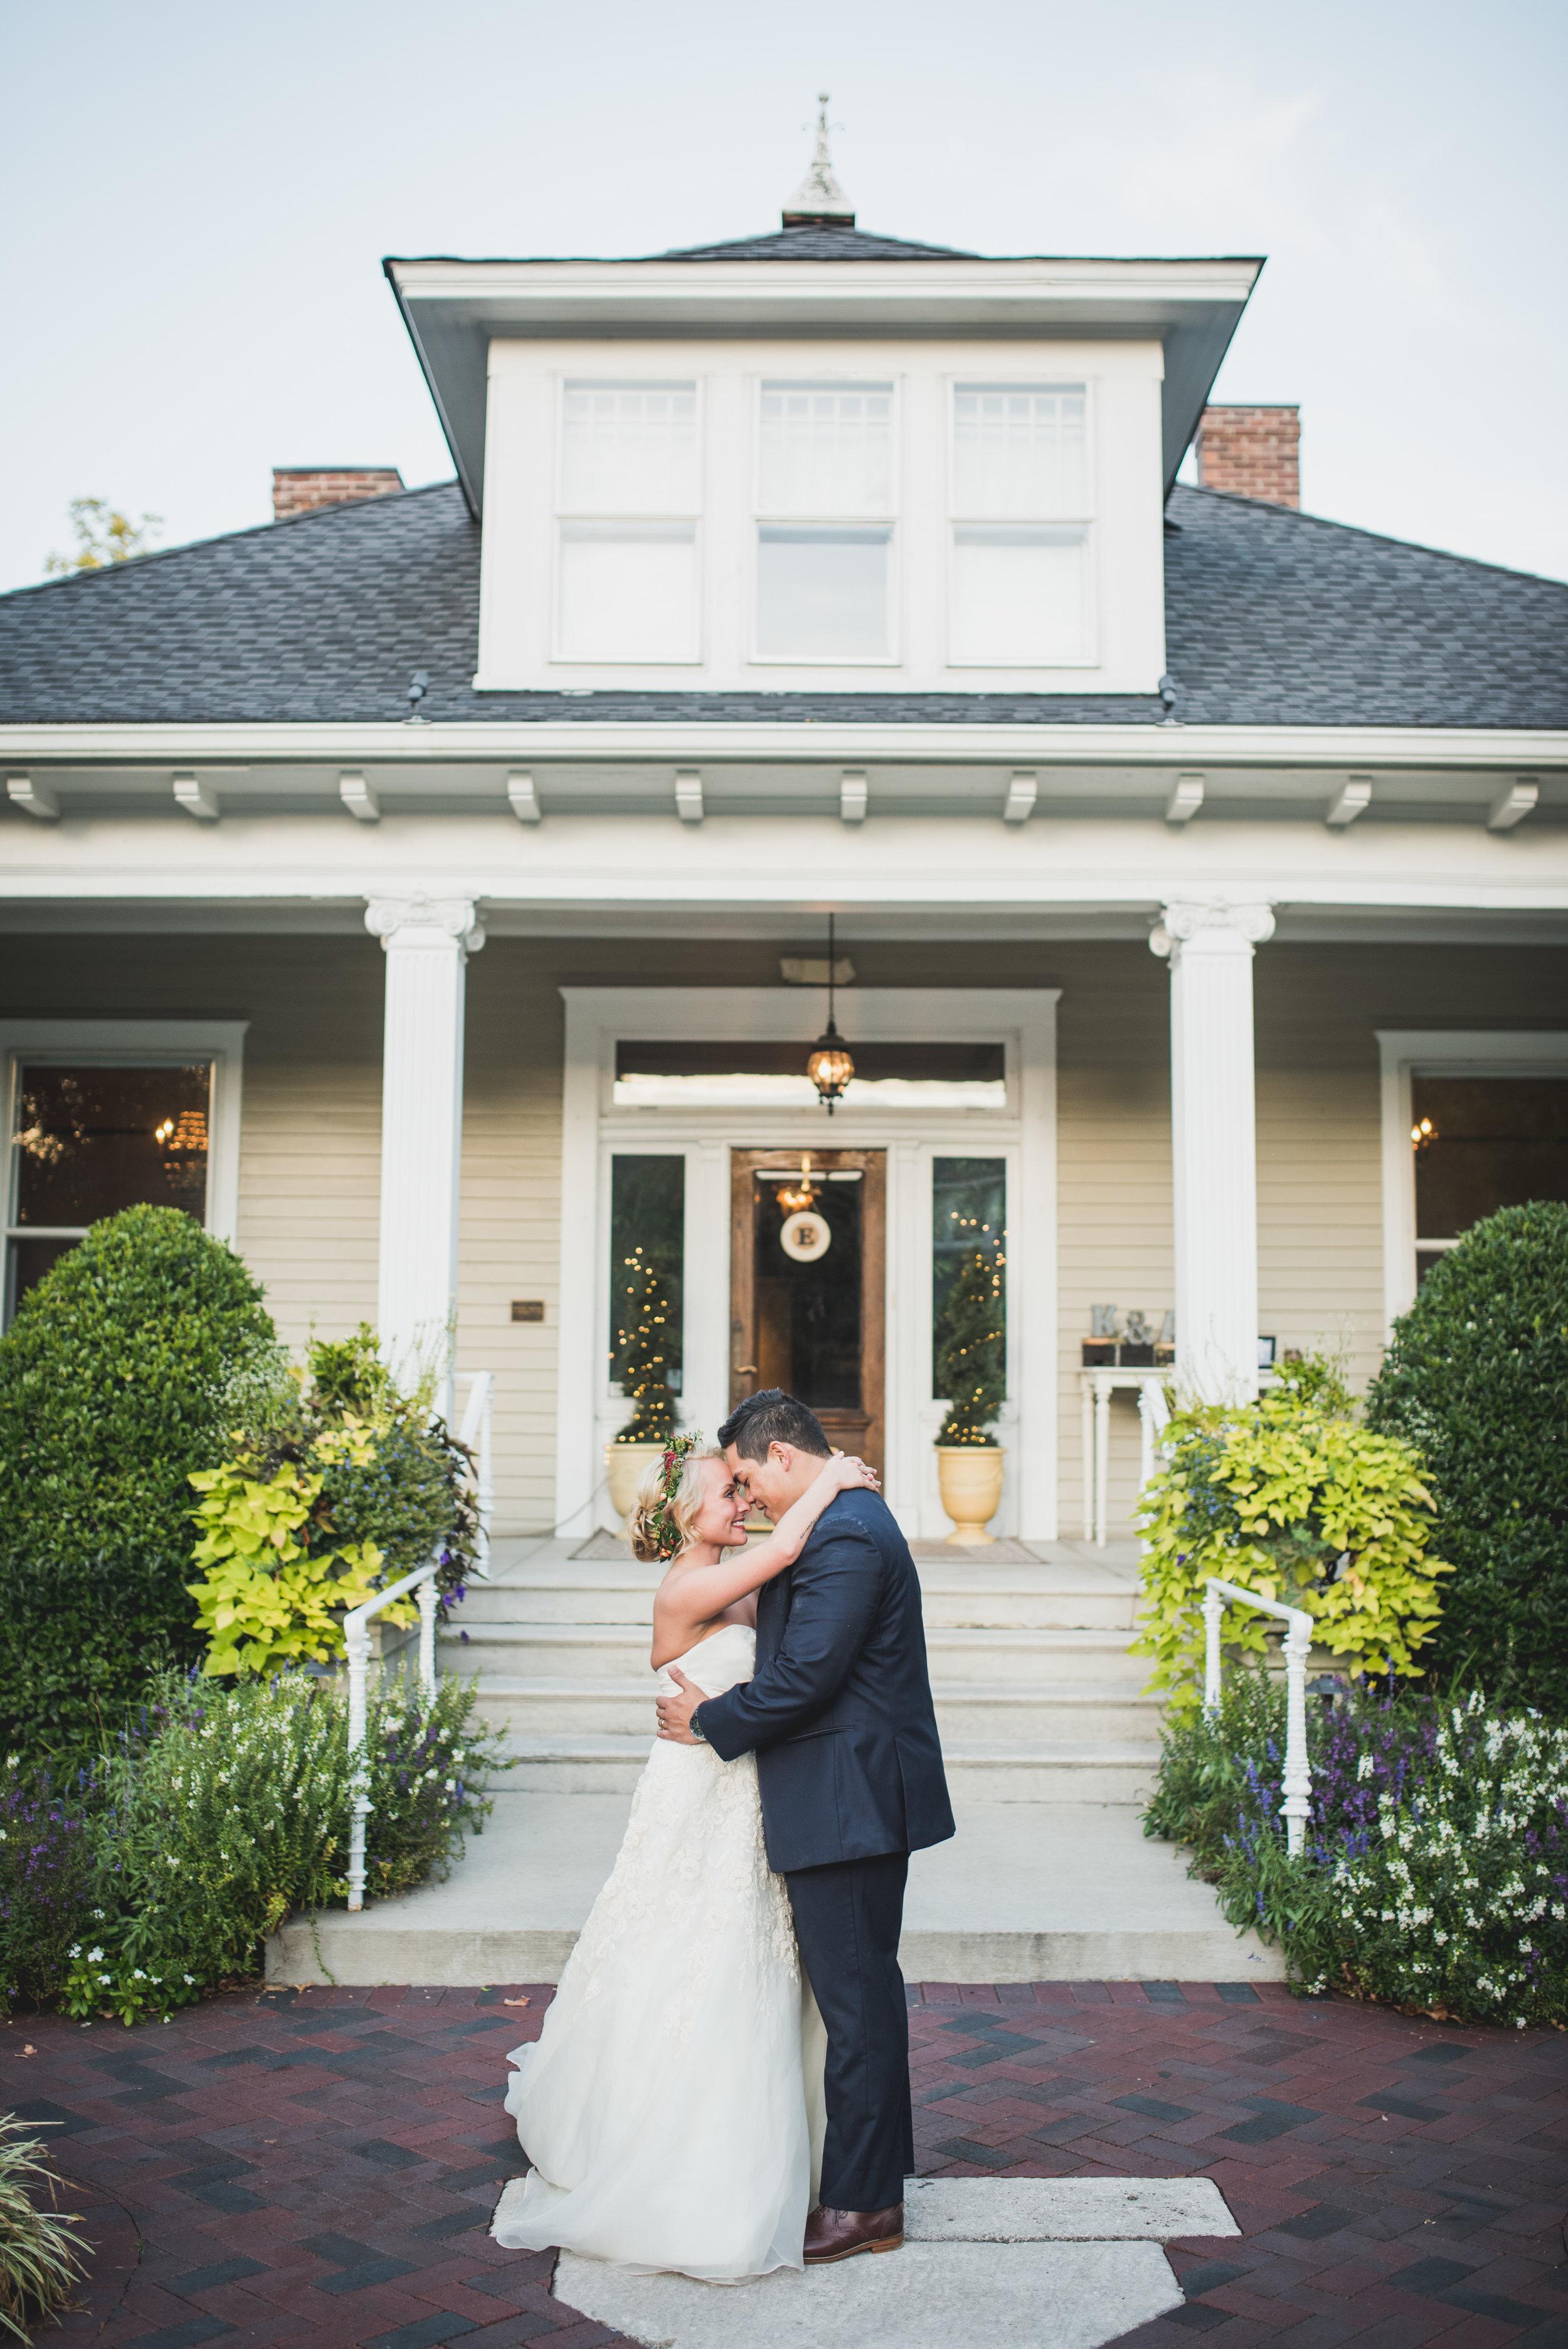 Nashville-wedding-photographers-CJ's-Off-The-Square-54.JPG